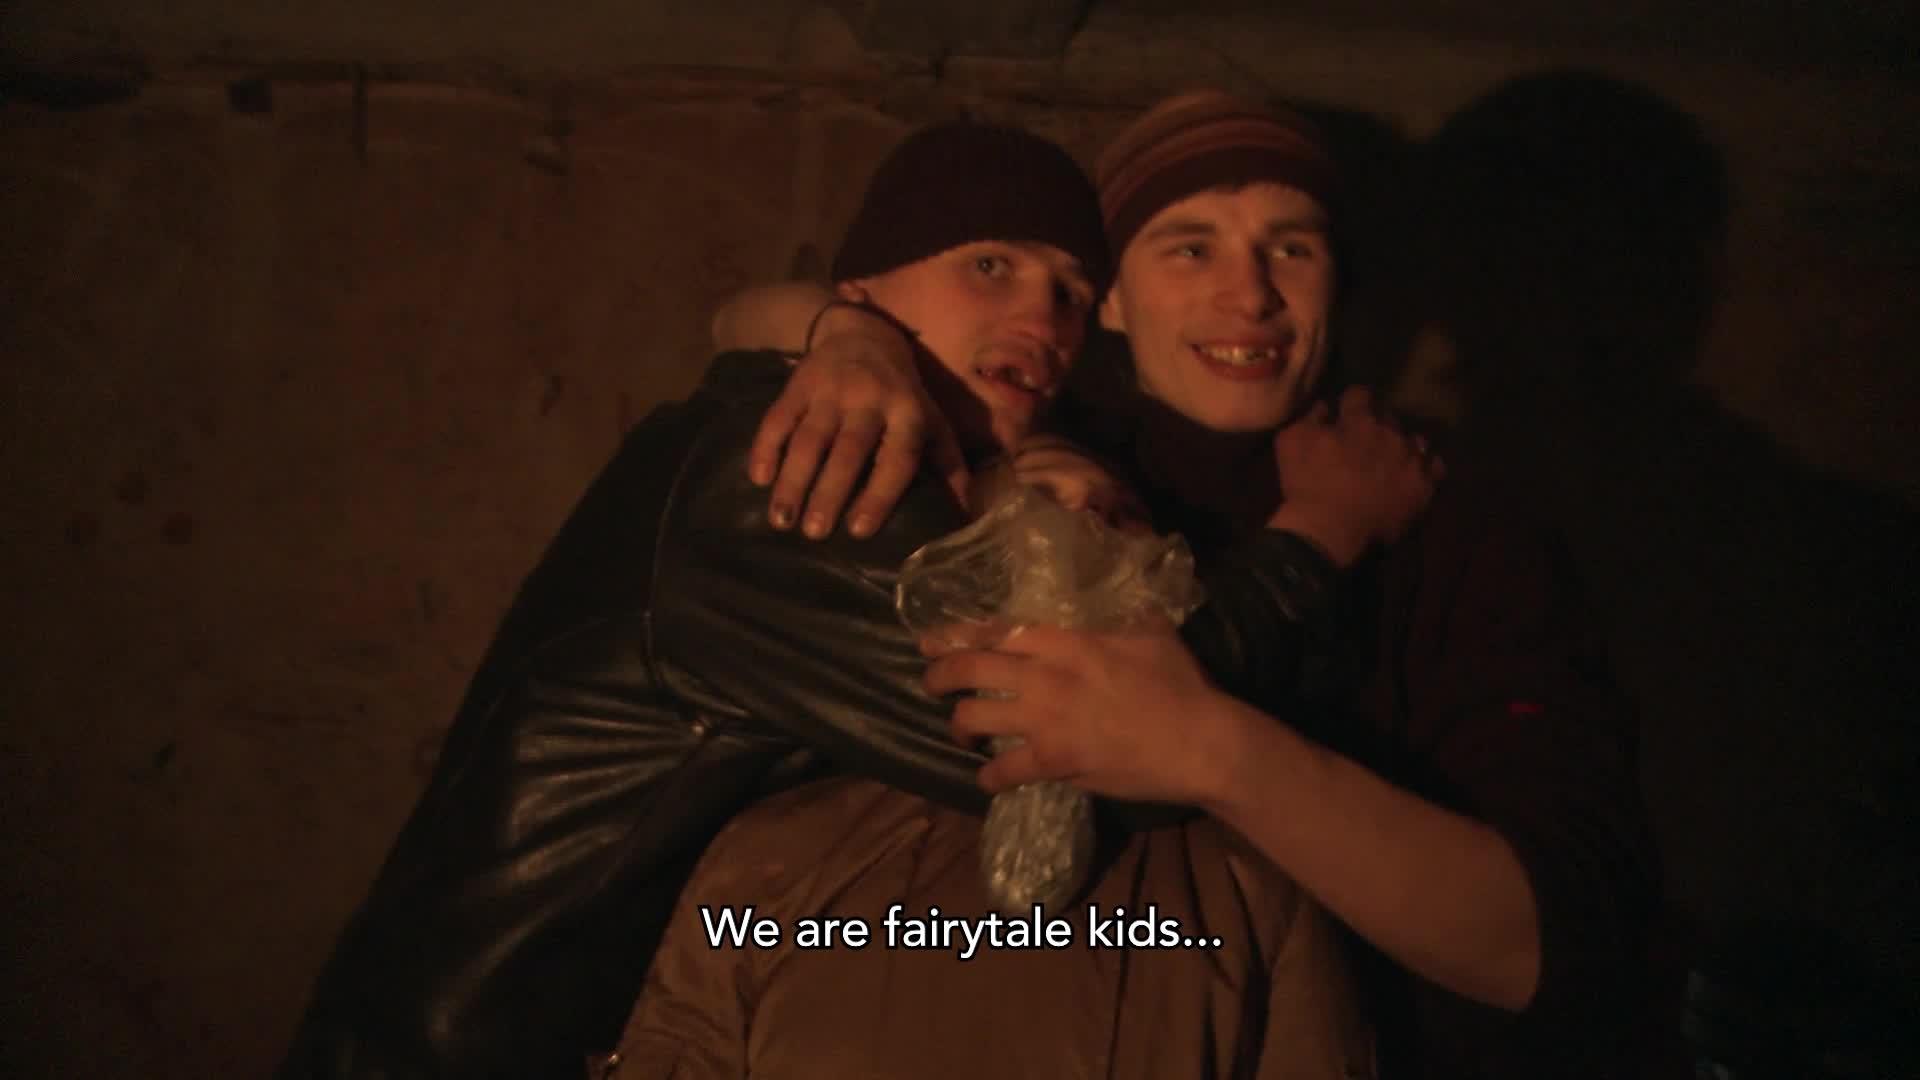 The best Soviet film fairy tale. Eighth round 3